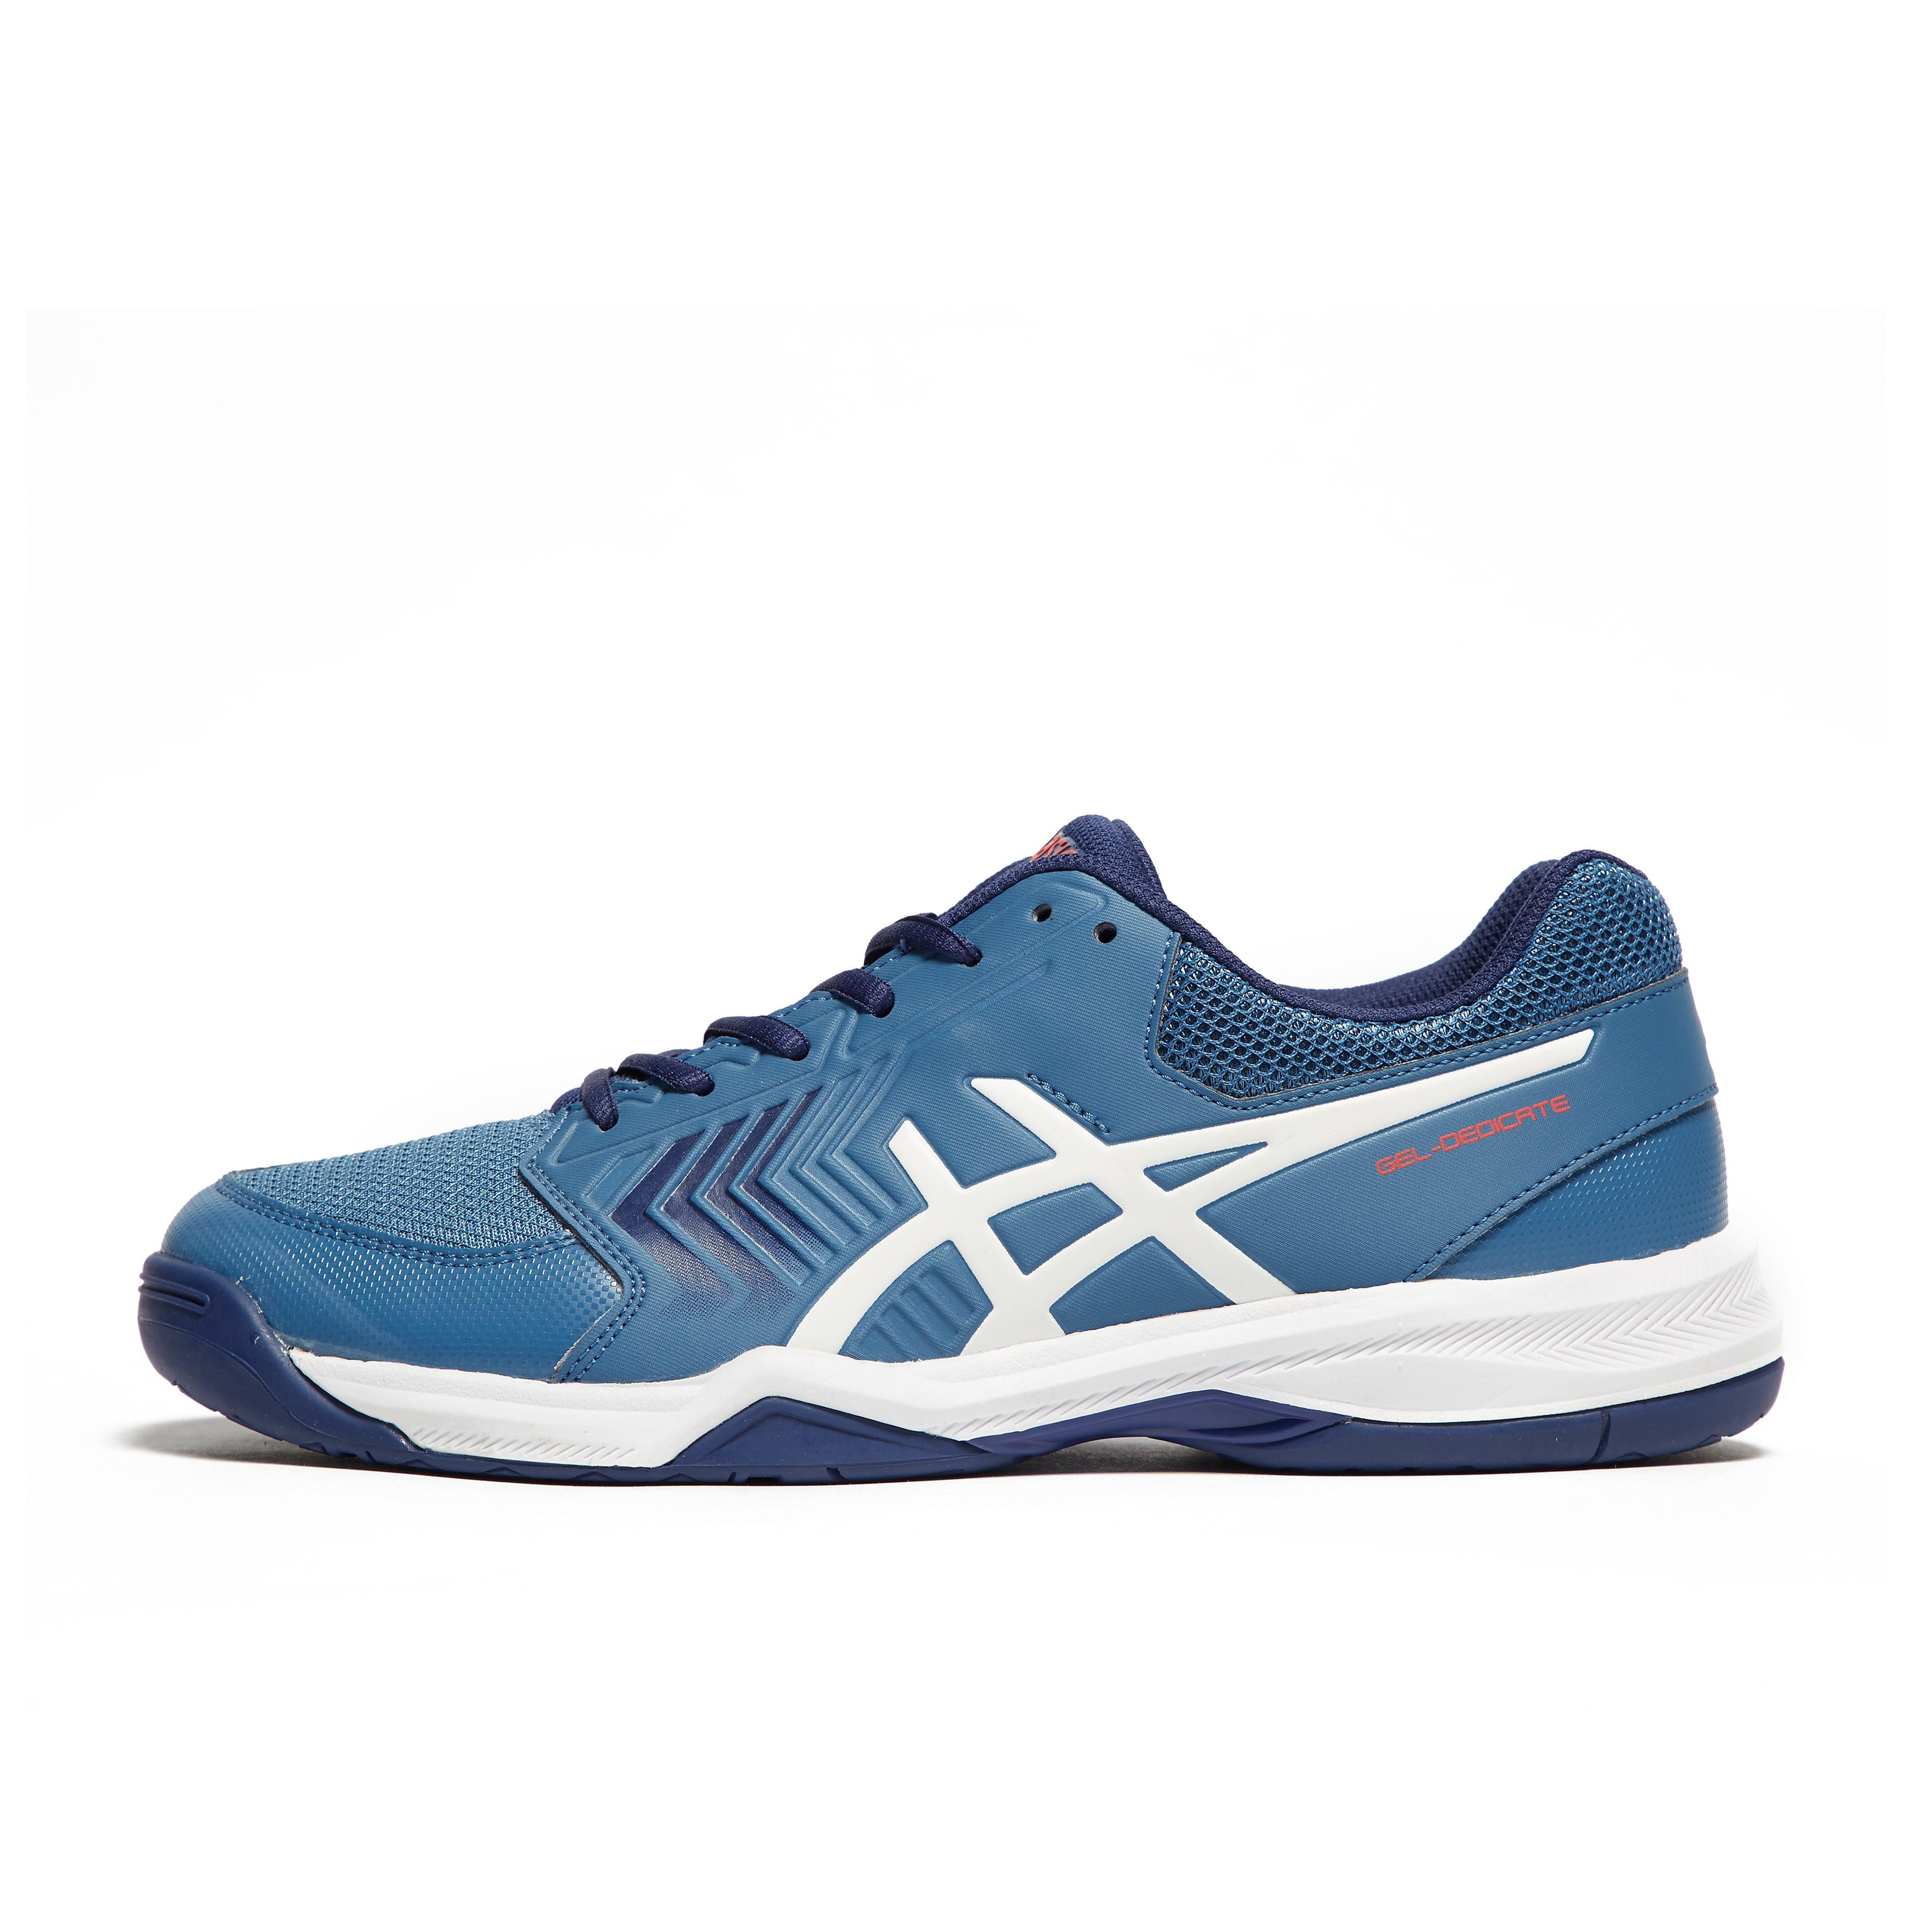 ASICS Gel-Dedicate 5 Men's Tennis Shoes